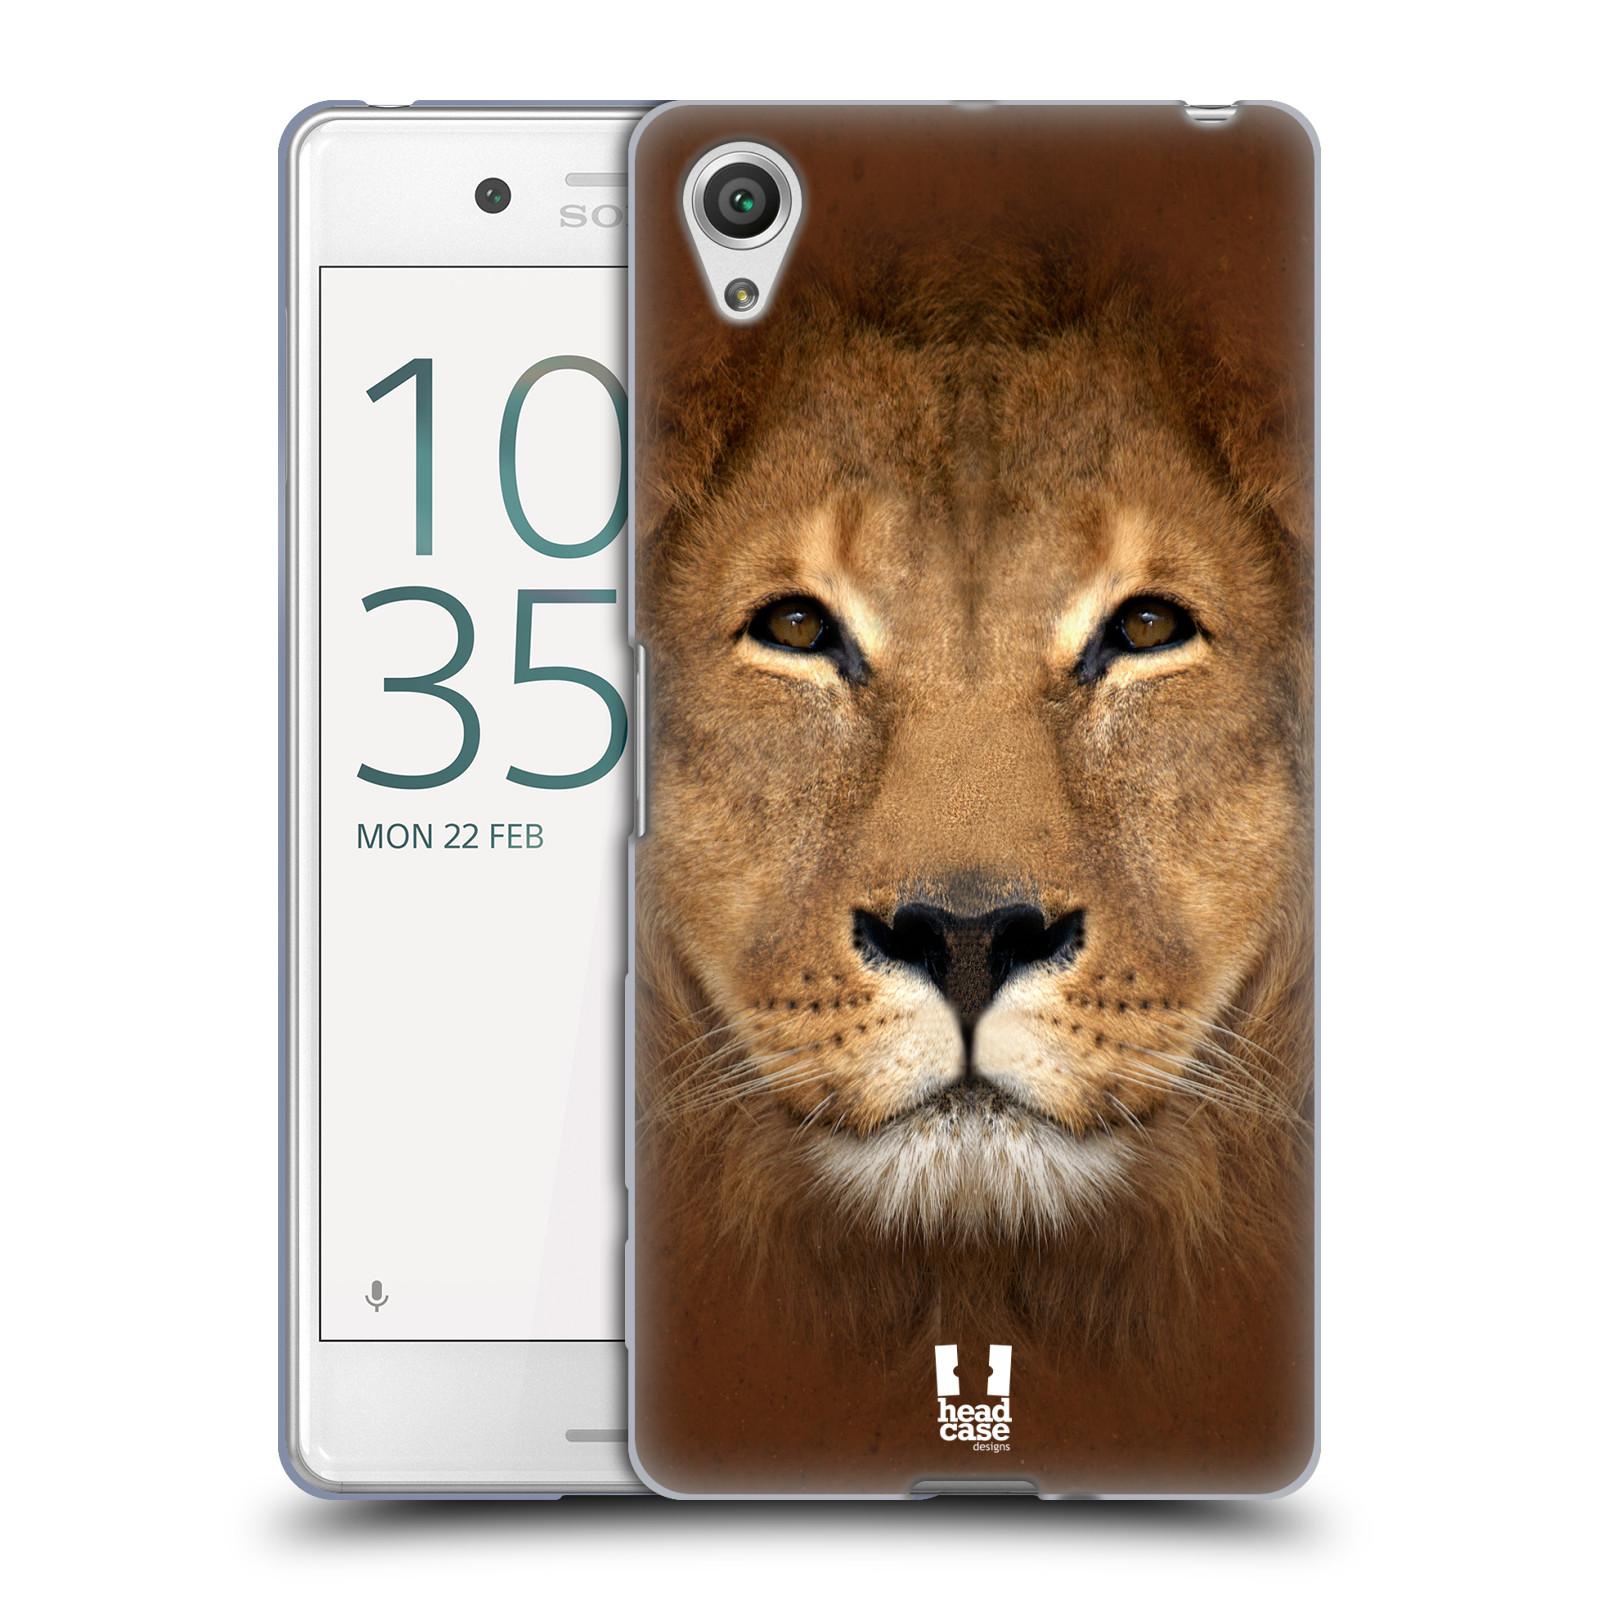 HEAD CASE silikonový obal na mobil Sony Xperia X PERFORMANCE (F8131, F8132) vzor Zvířecí tváře 2 Lev